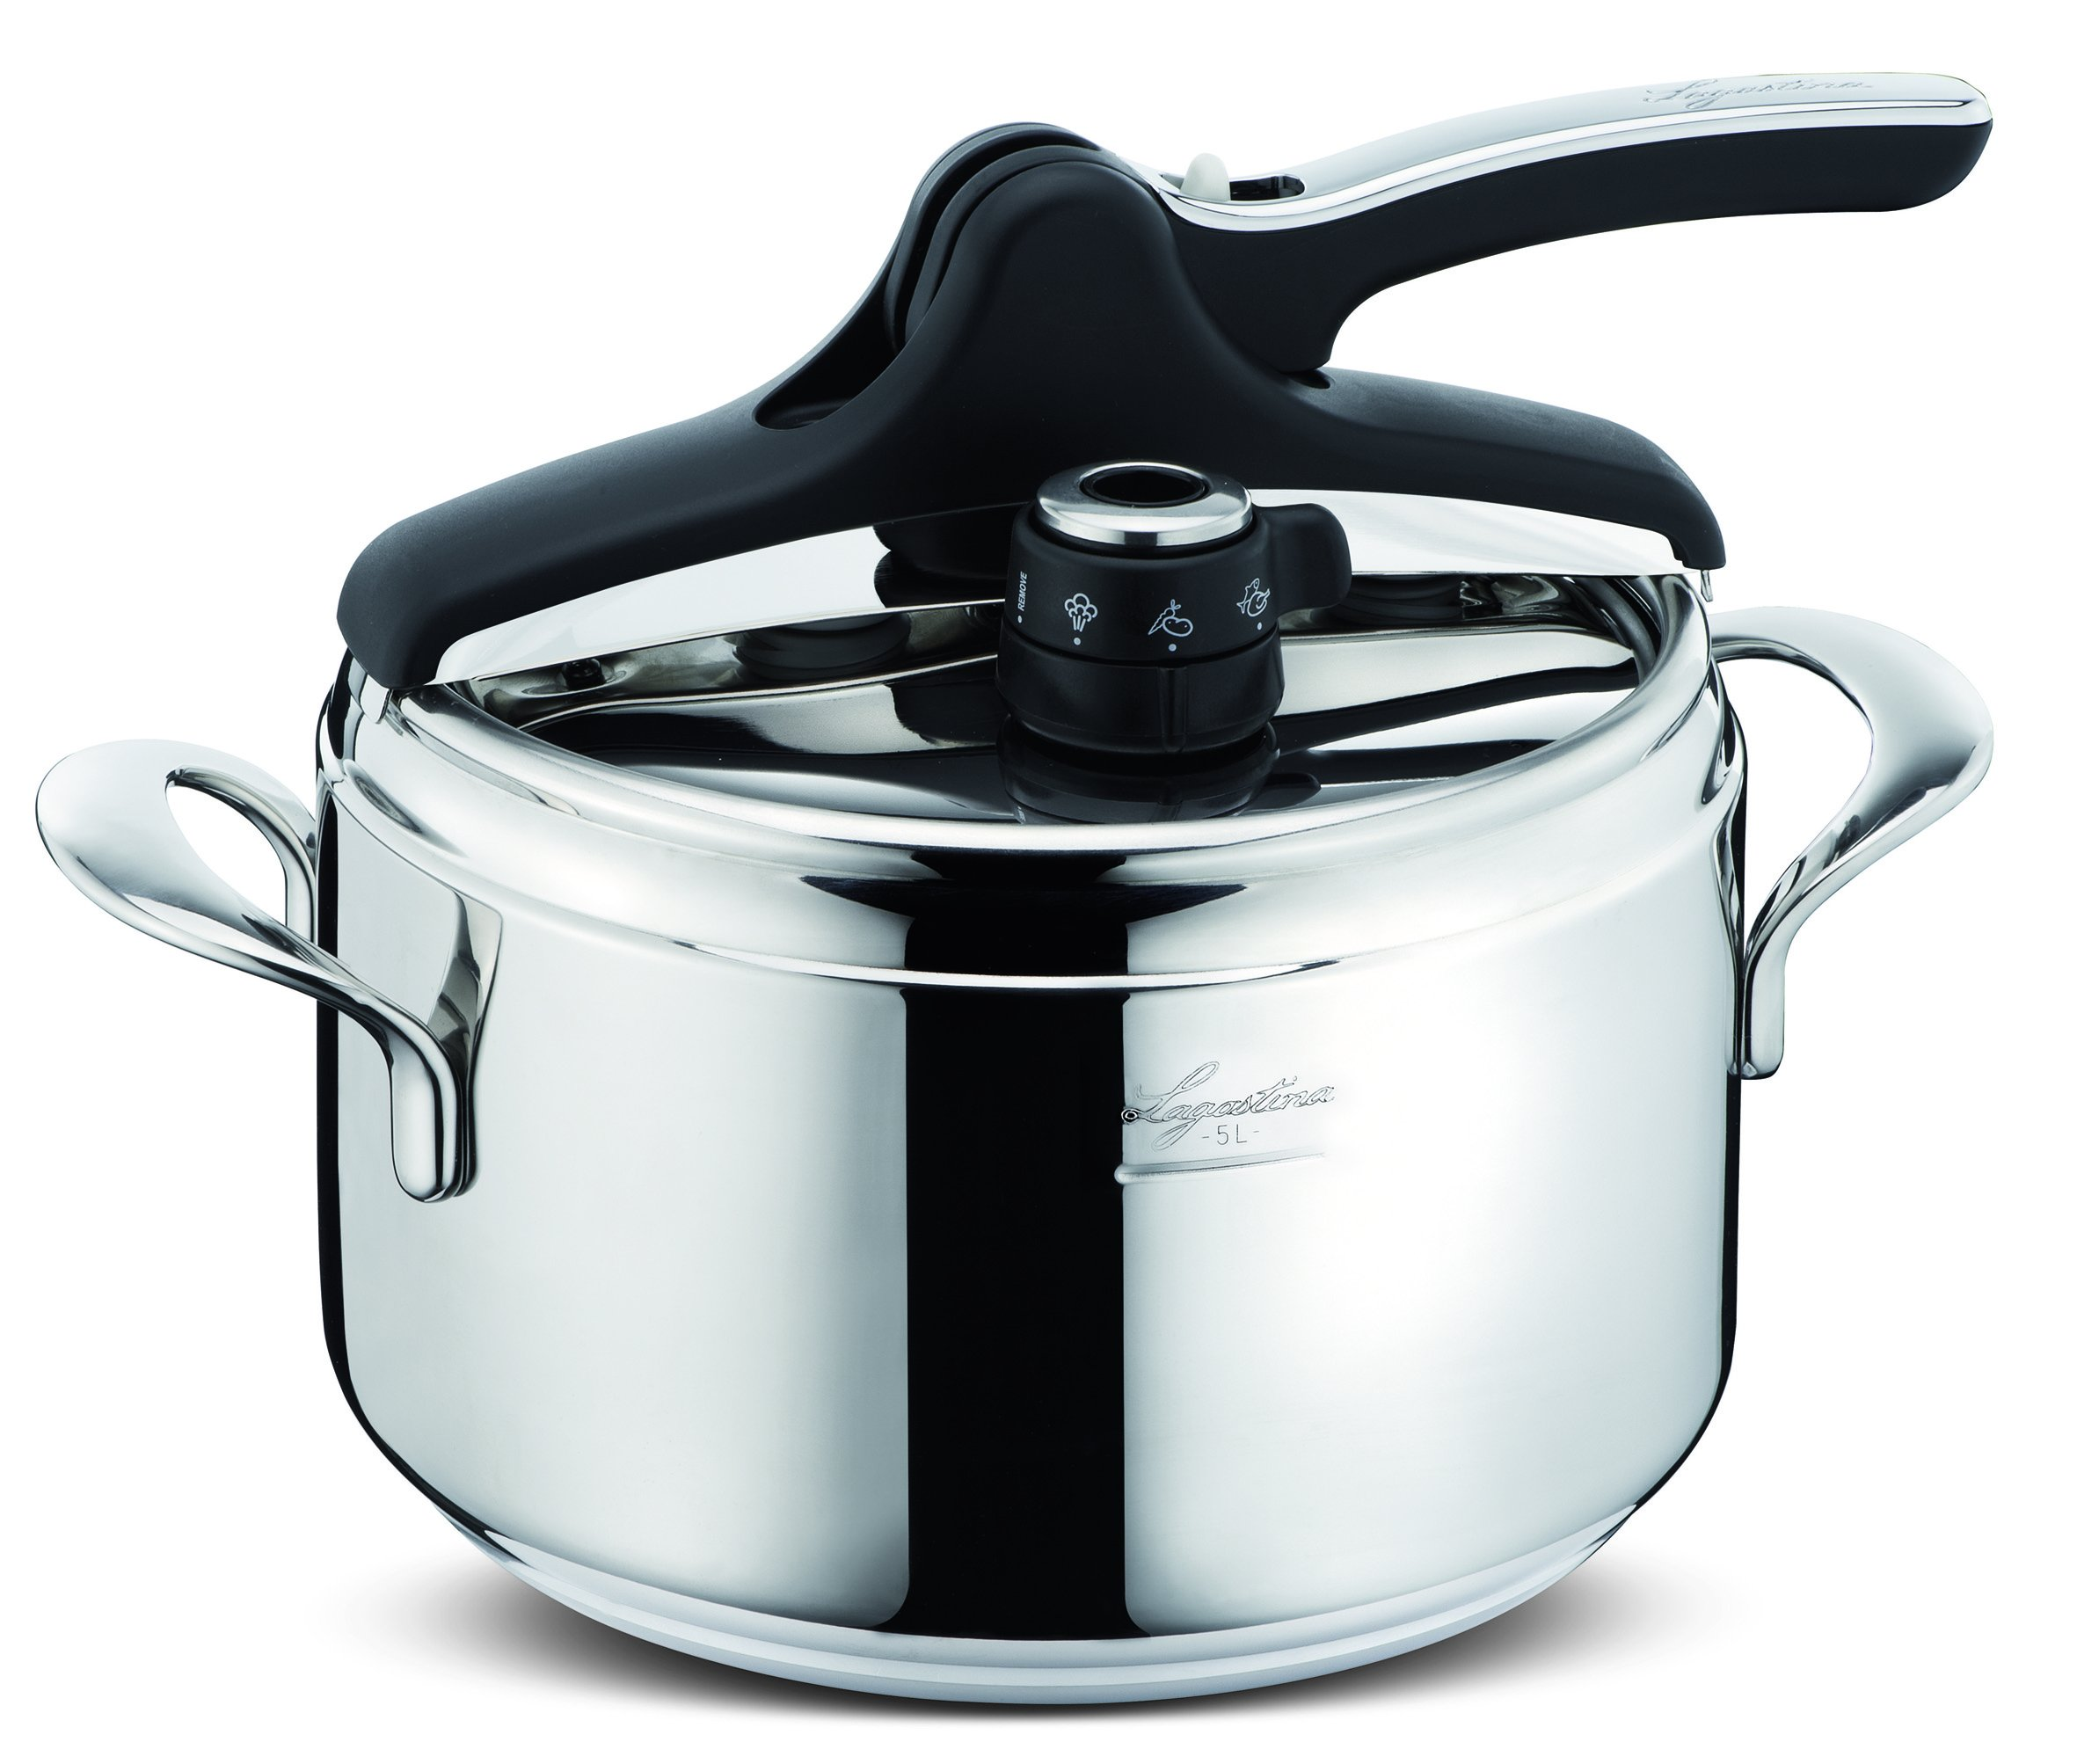 Pressure cooker lt. 5 DOMINA VITAMIN